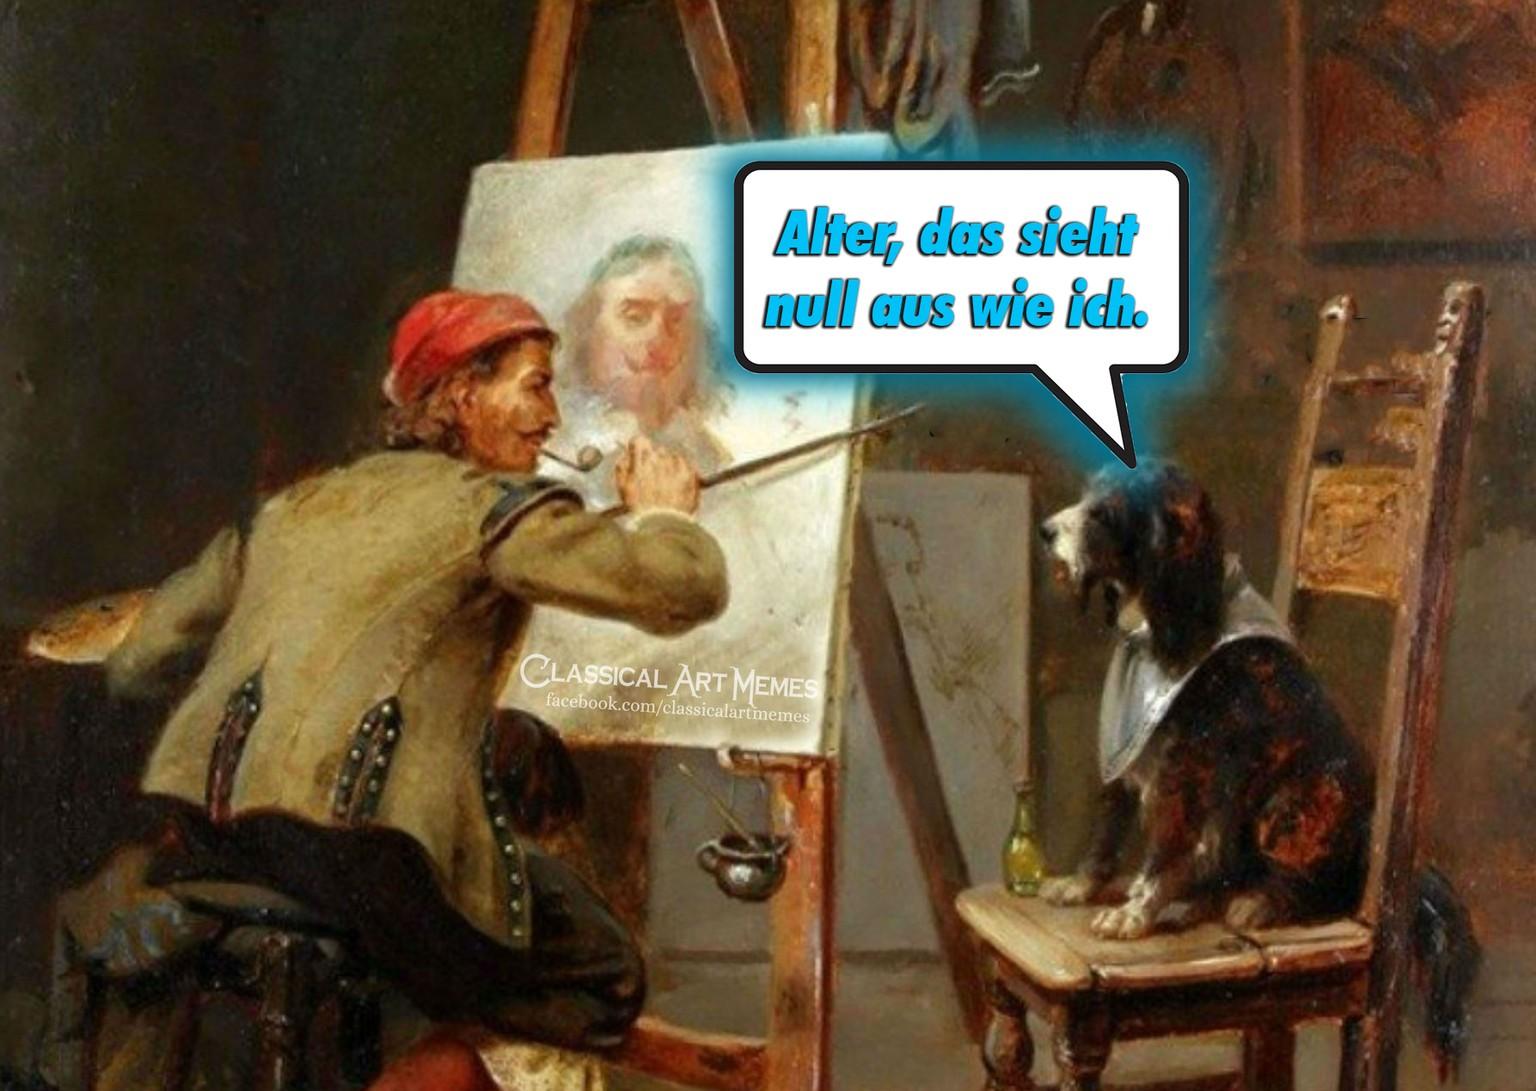 Classical Art Memes 19 Malerei Memes Die Besser Sind Als Jedes Museum Watson